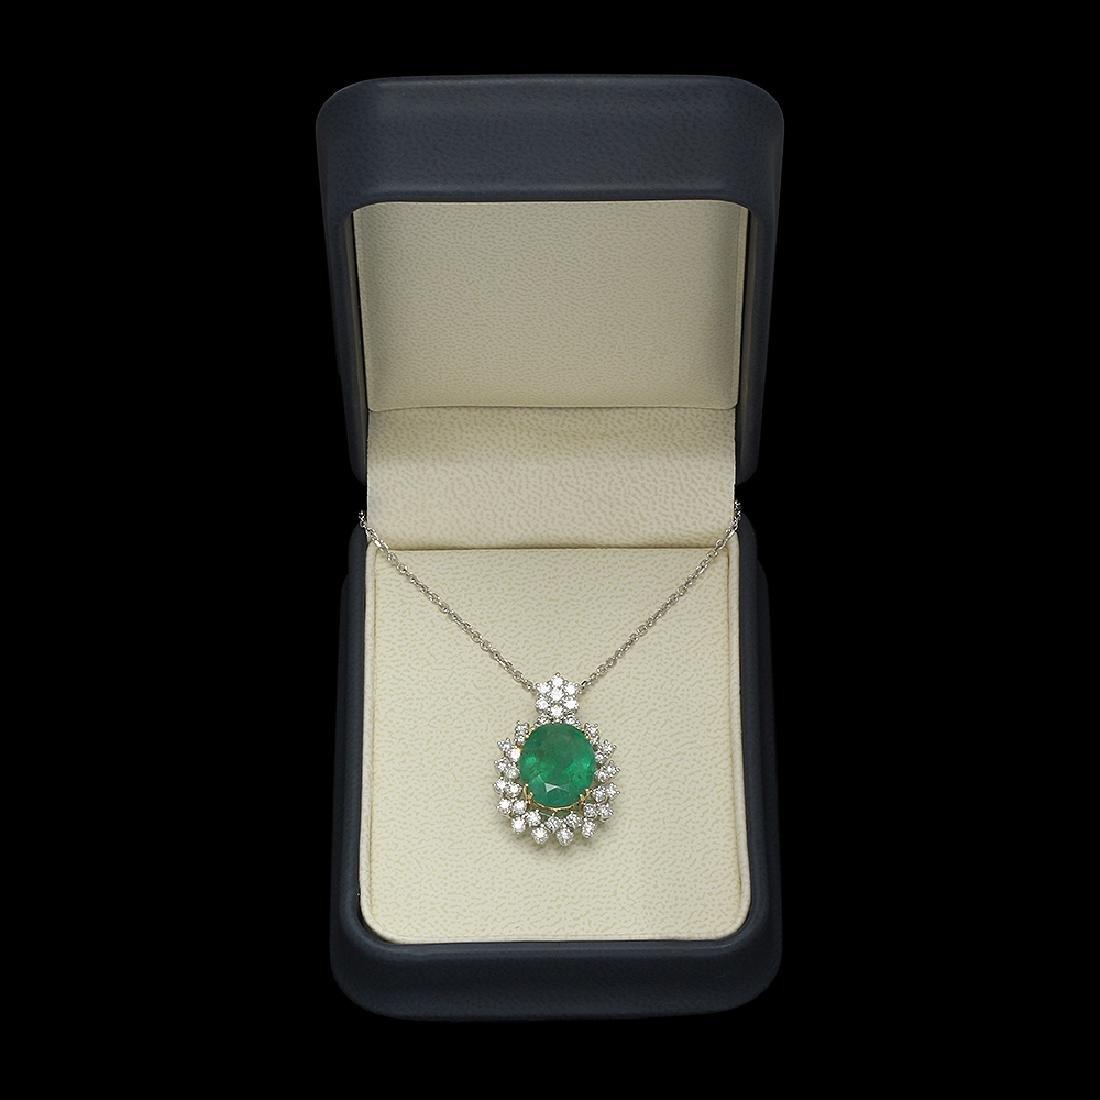 14K Gold 7.50ct Emerald 1.70ct Diamond Pendant - 3